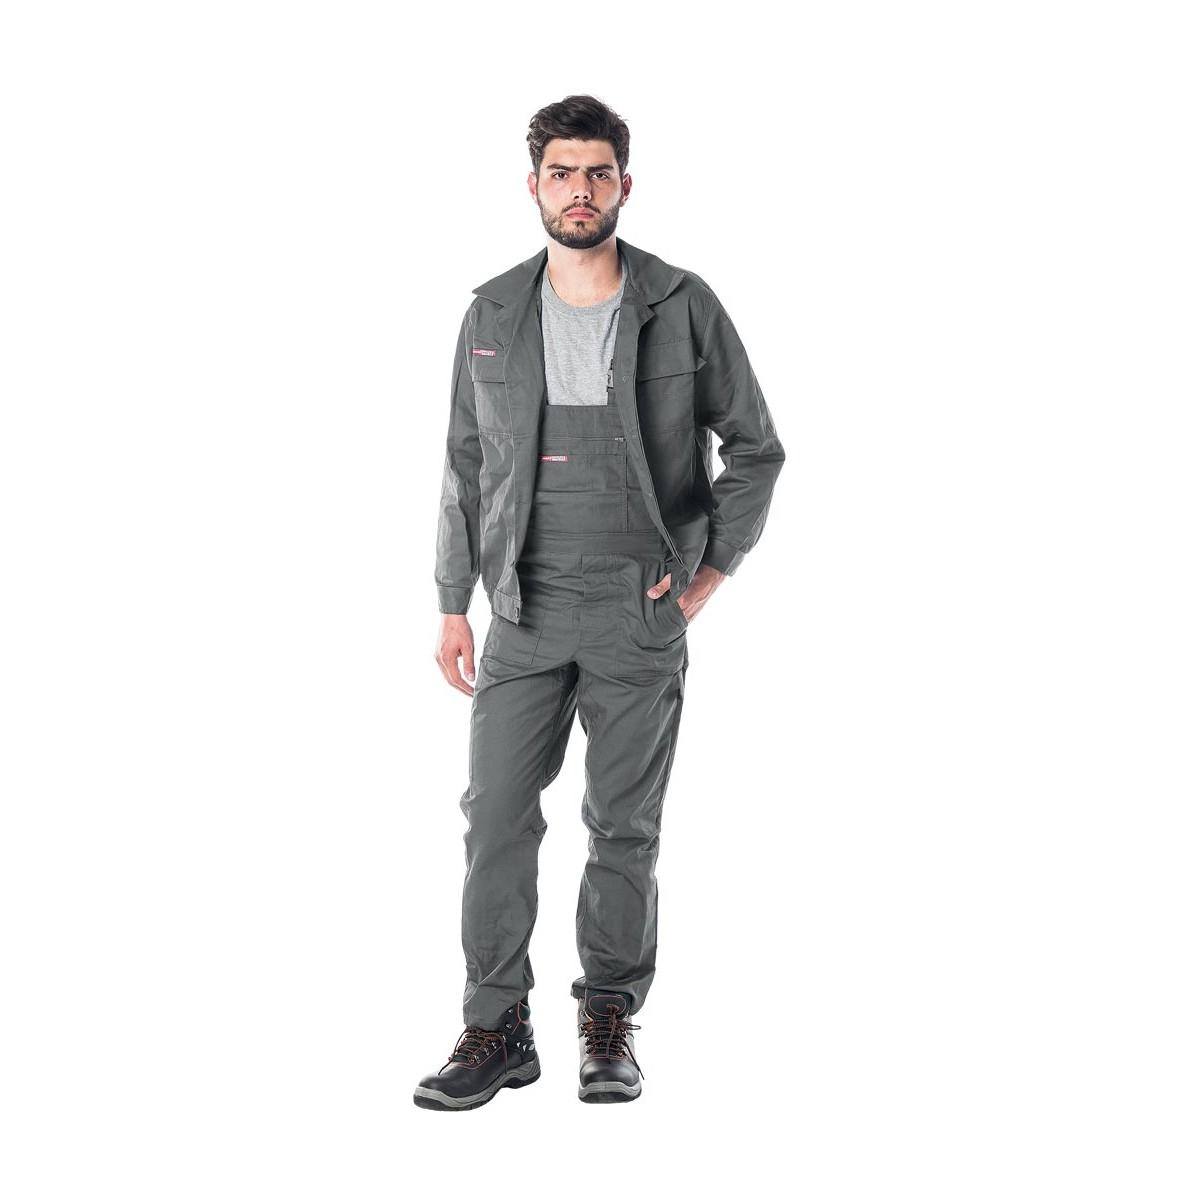 Komplet ubranie robocze bluza + spodnie szare UMS r. 46 - 62